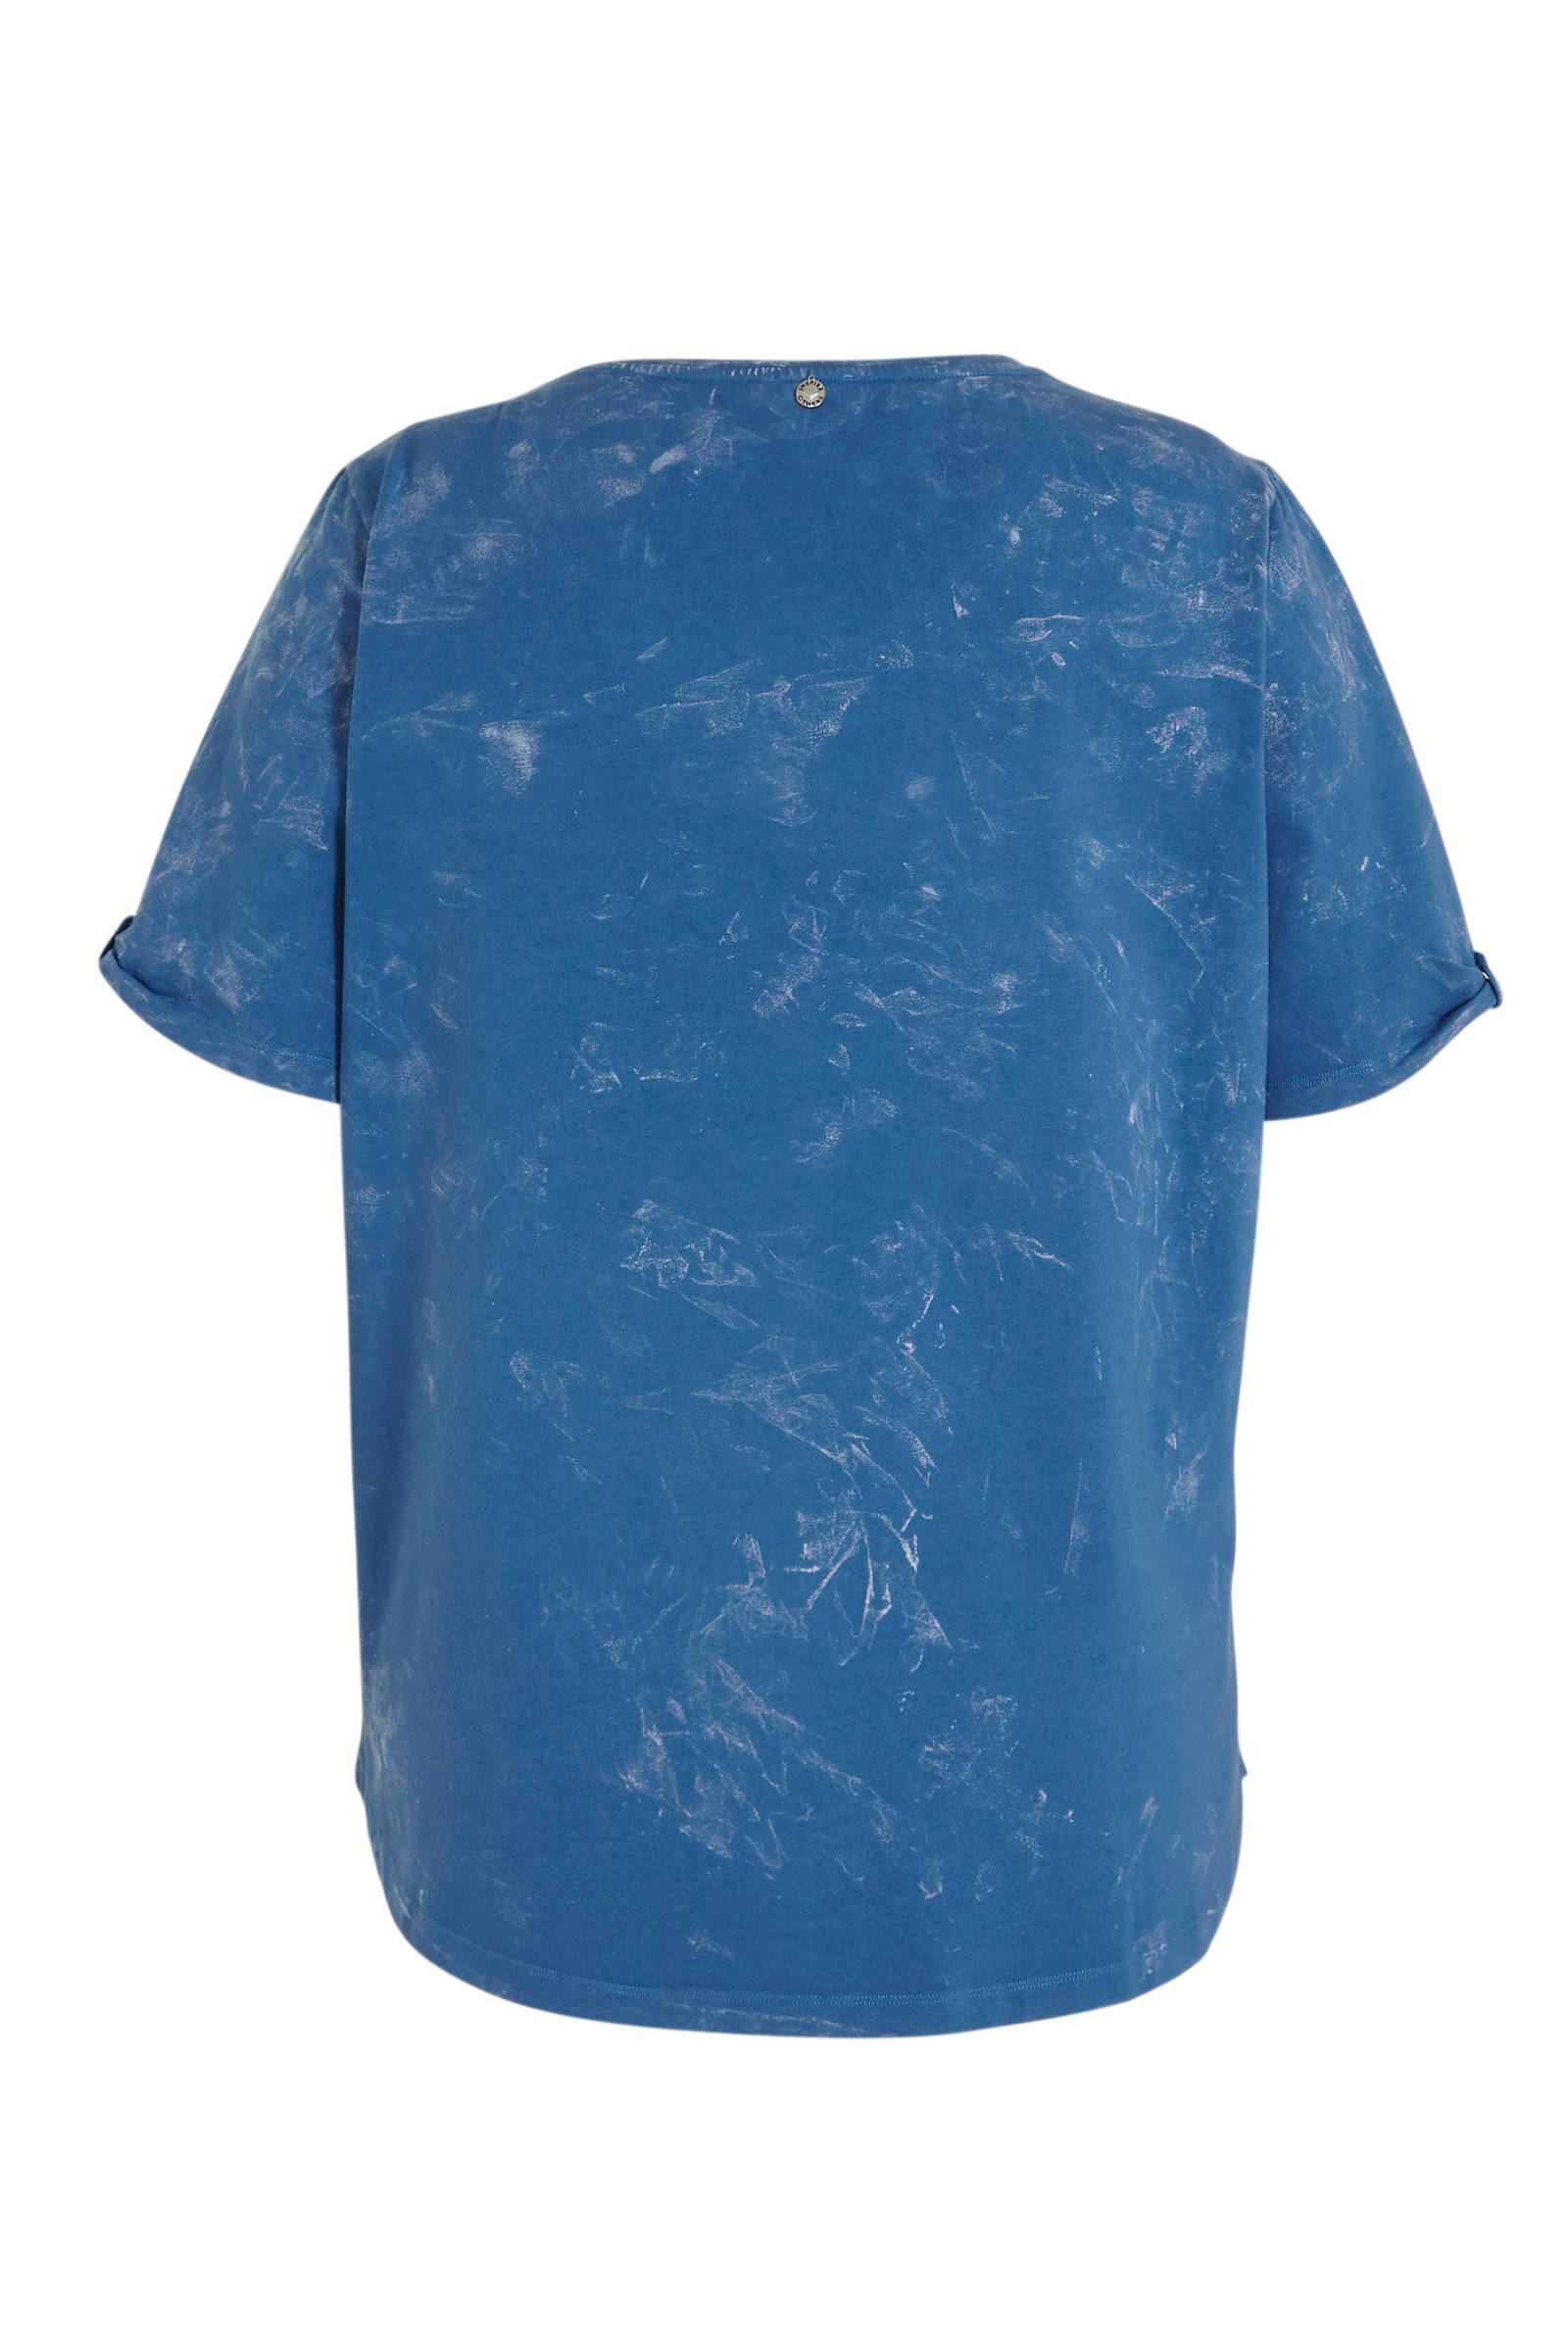 No Secret T-shirt met printopdruk blauw